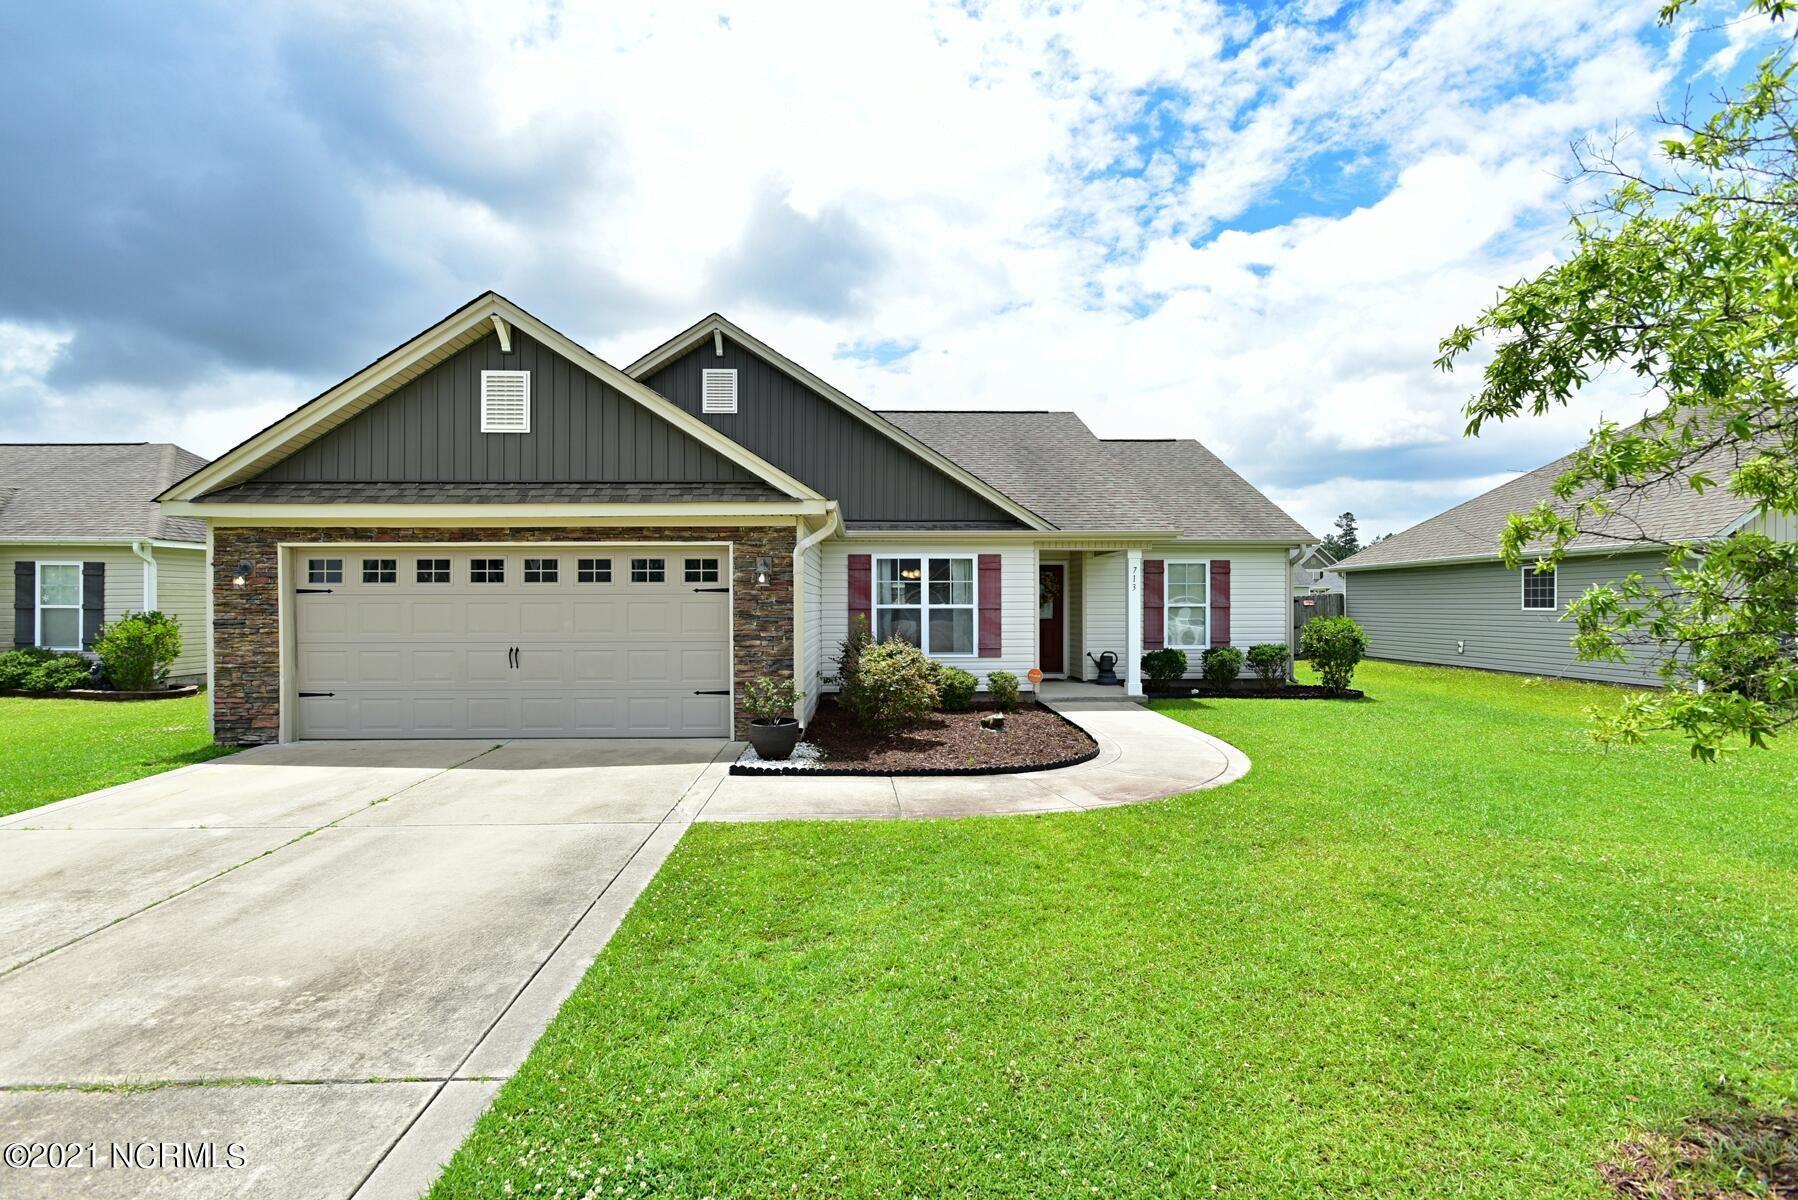 Photo of 713 Radiant Drive, Jacksonville, NC 28546 (MLS # 100285909)